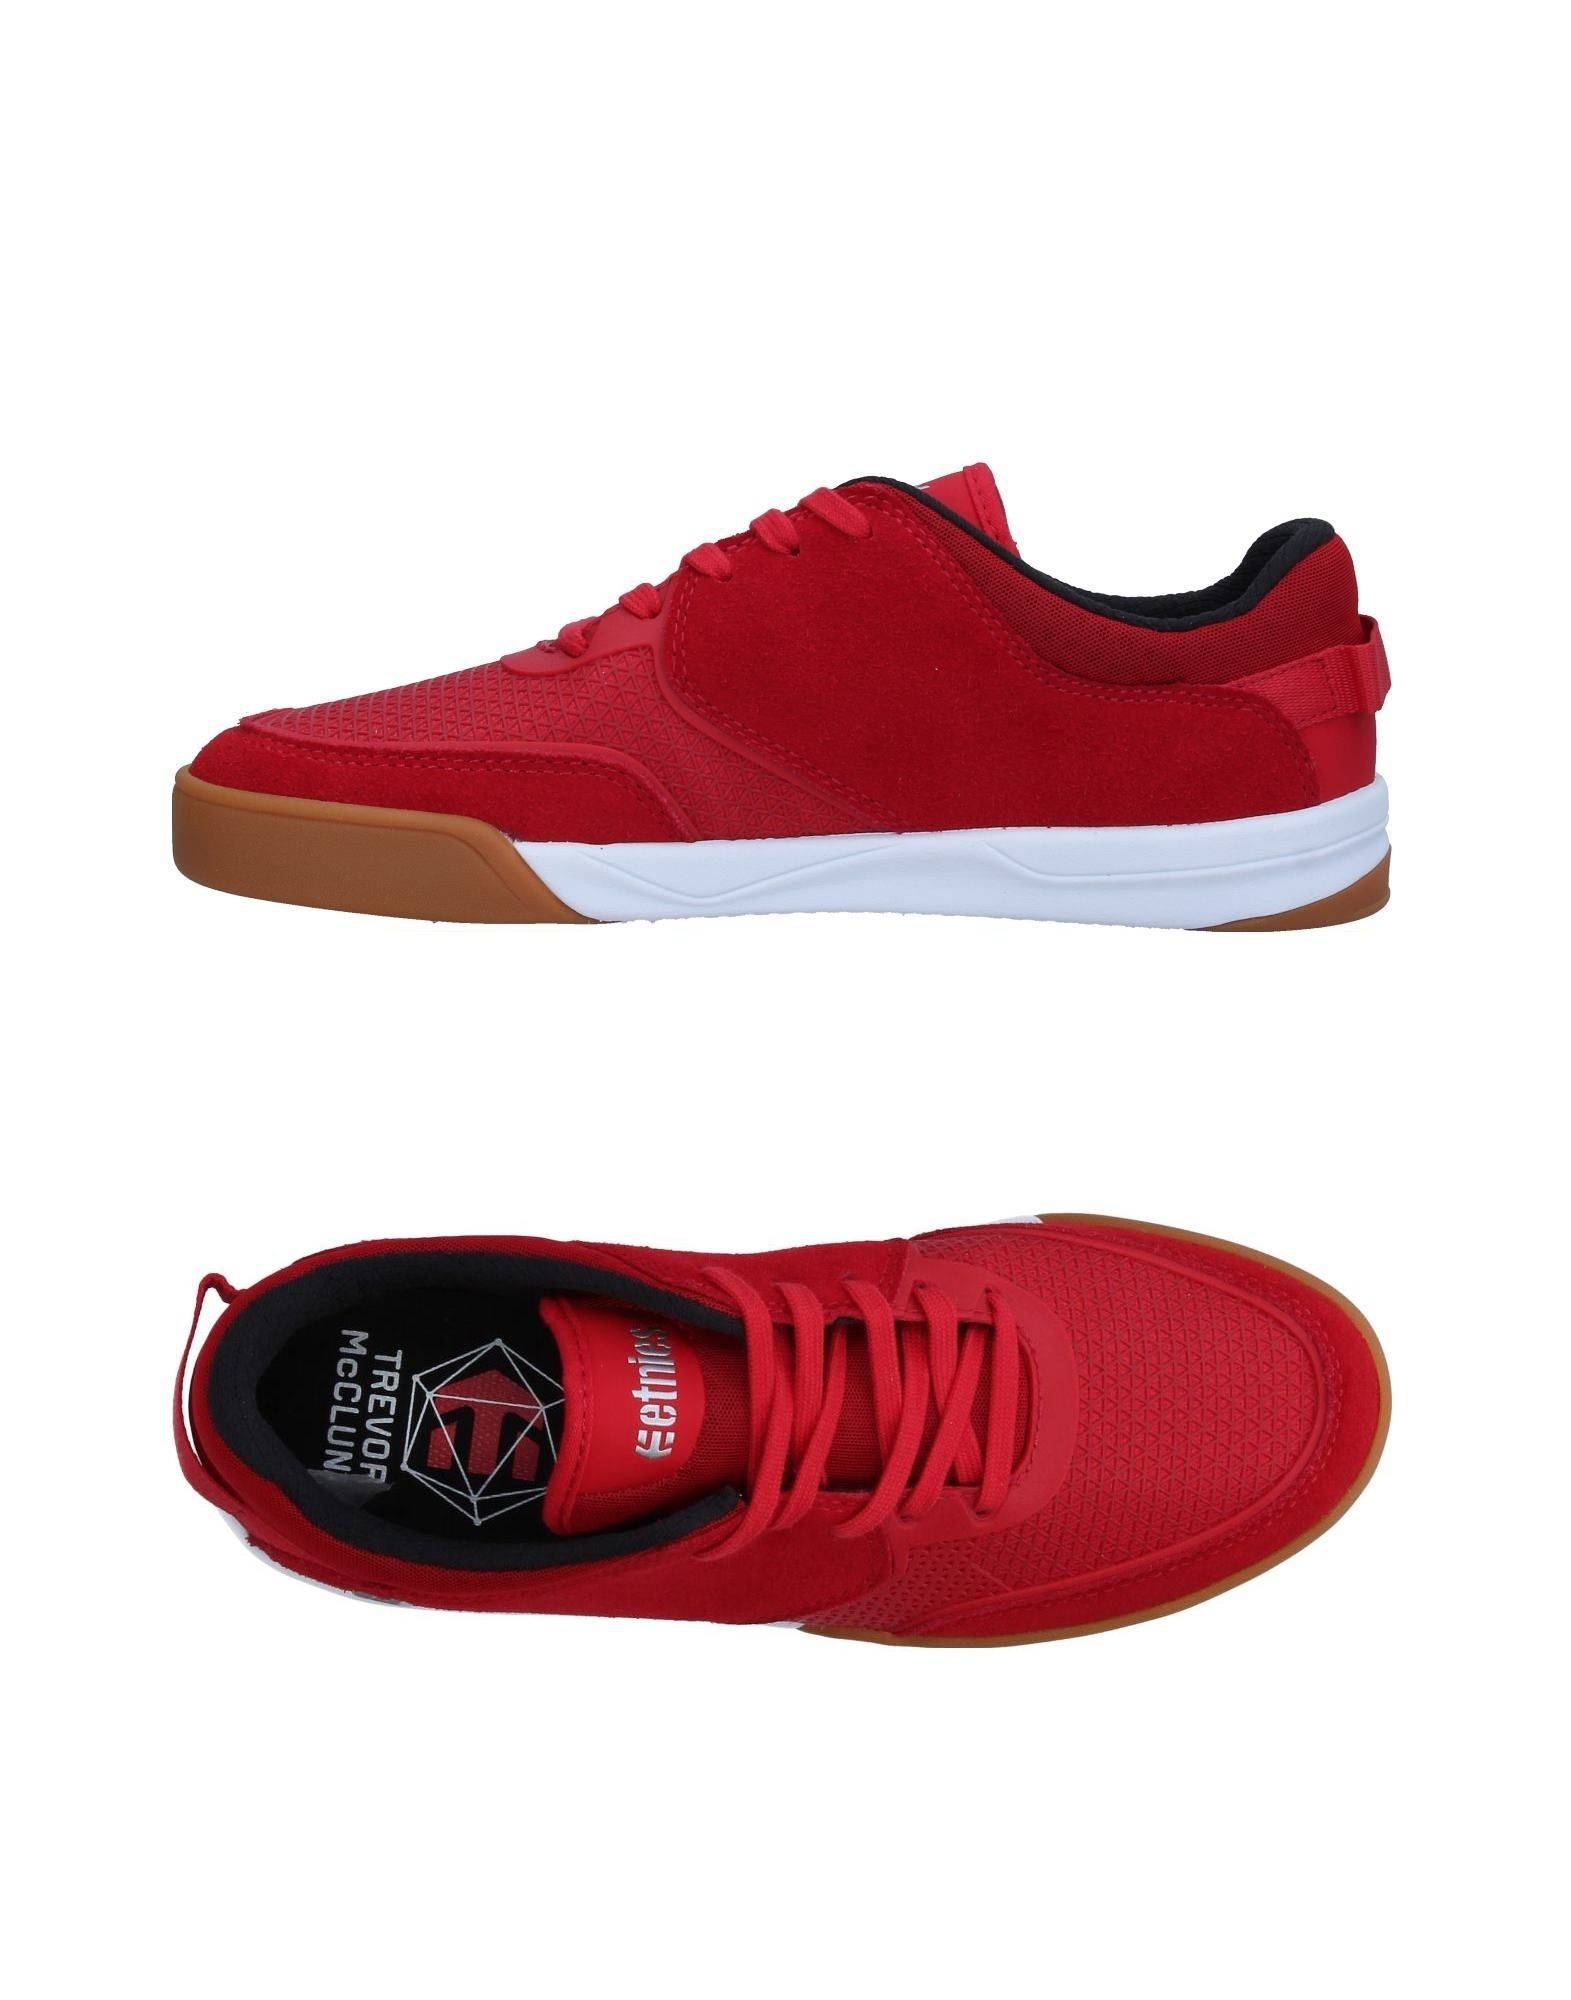 Moda Sneakers Etnies Uomo - 11340301OV